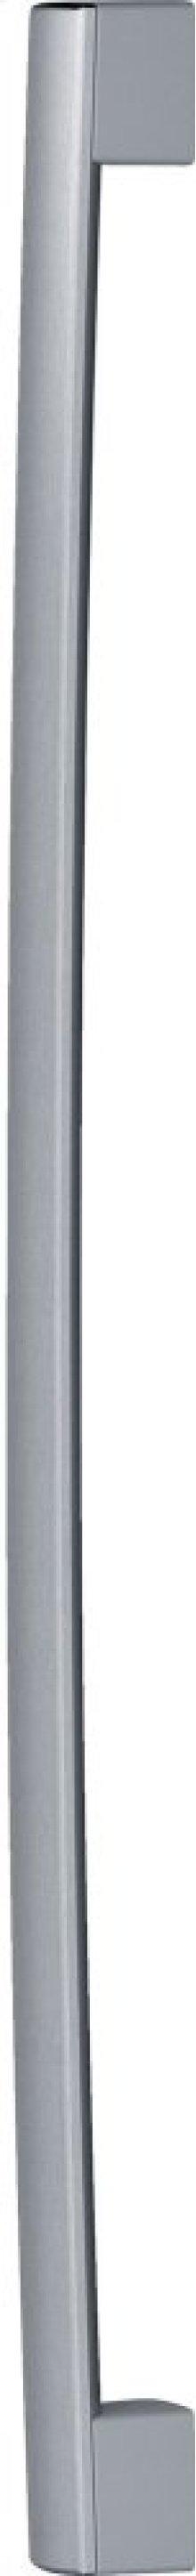 "36"" Handle for Single Door Refrigeration"